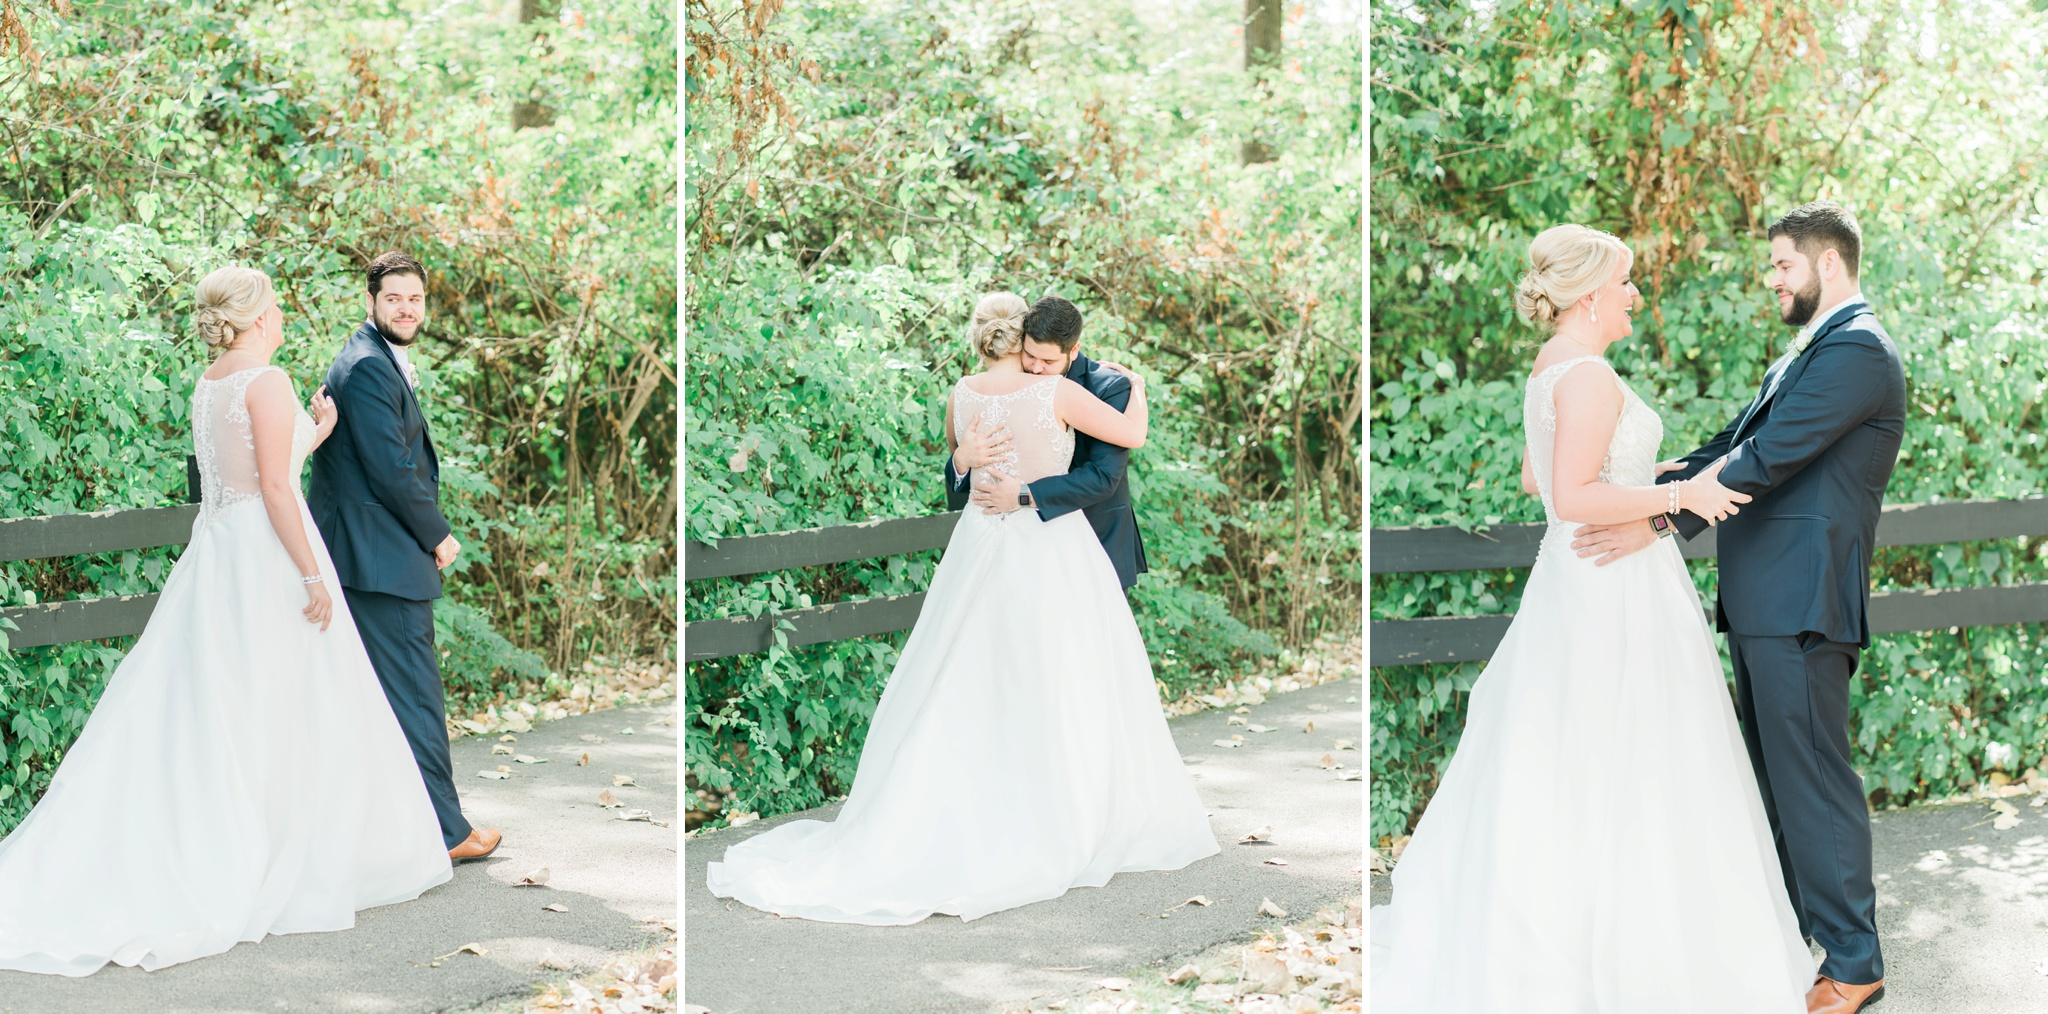 aladdin-shrine-center-wedding-grove-city-ohio-amber-jared_0029.jpg